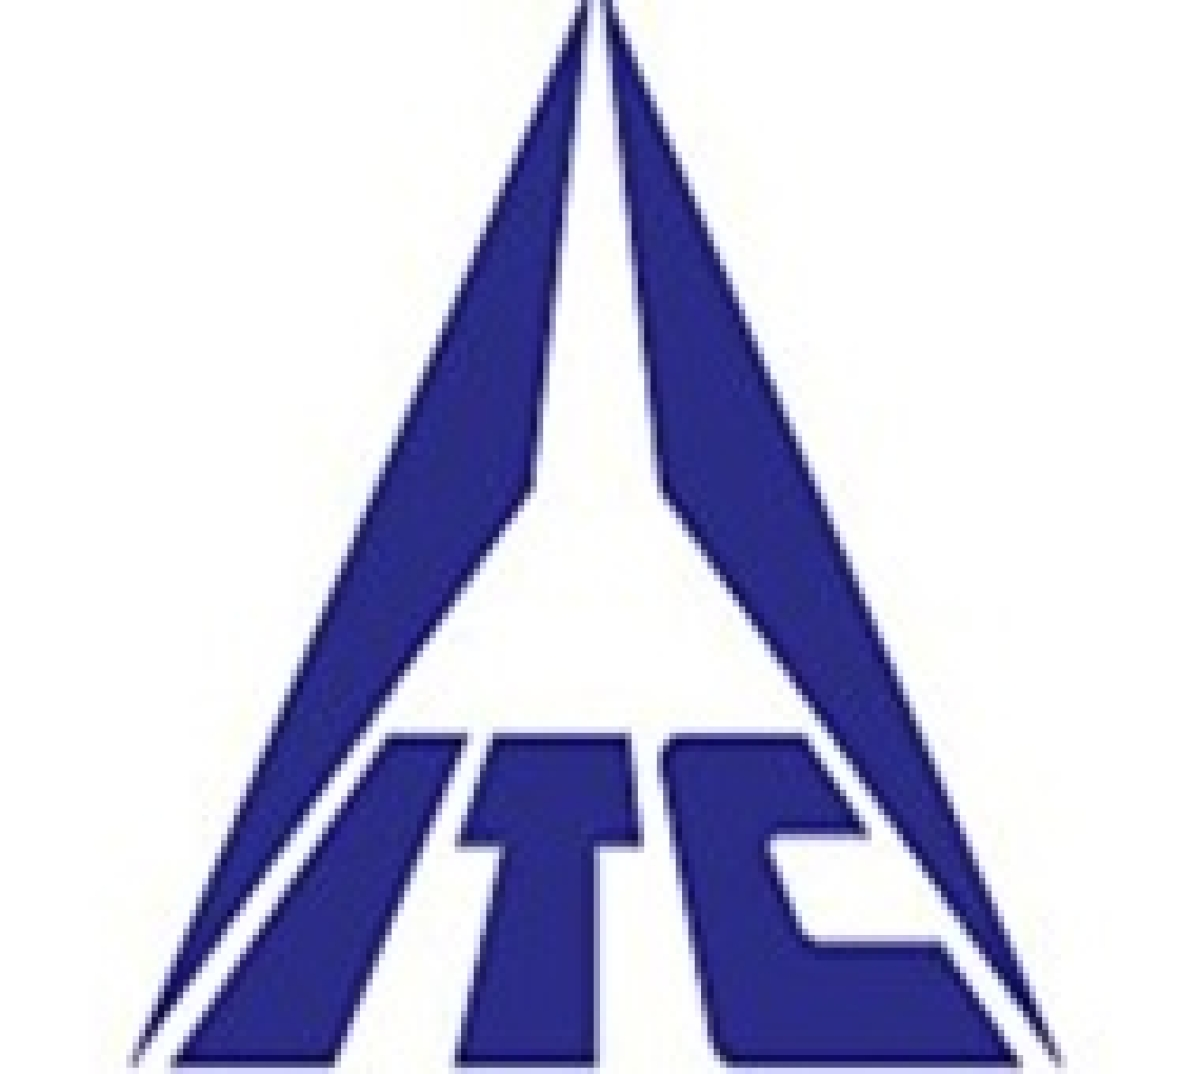 ITC Q1 net up 12.69 per cent